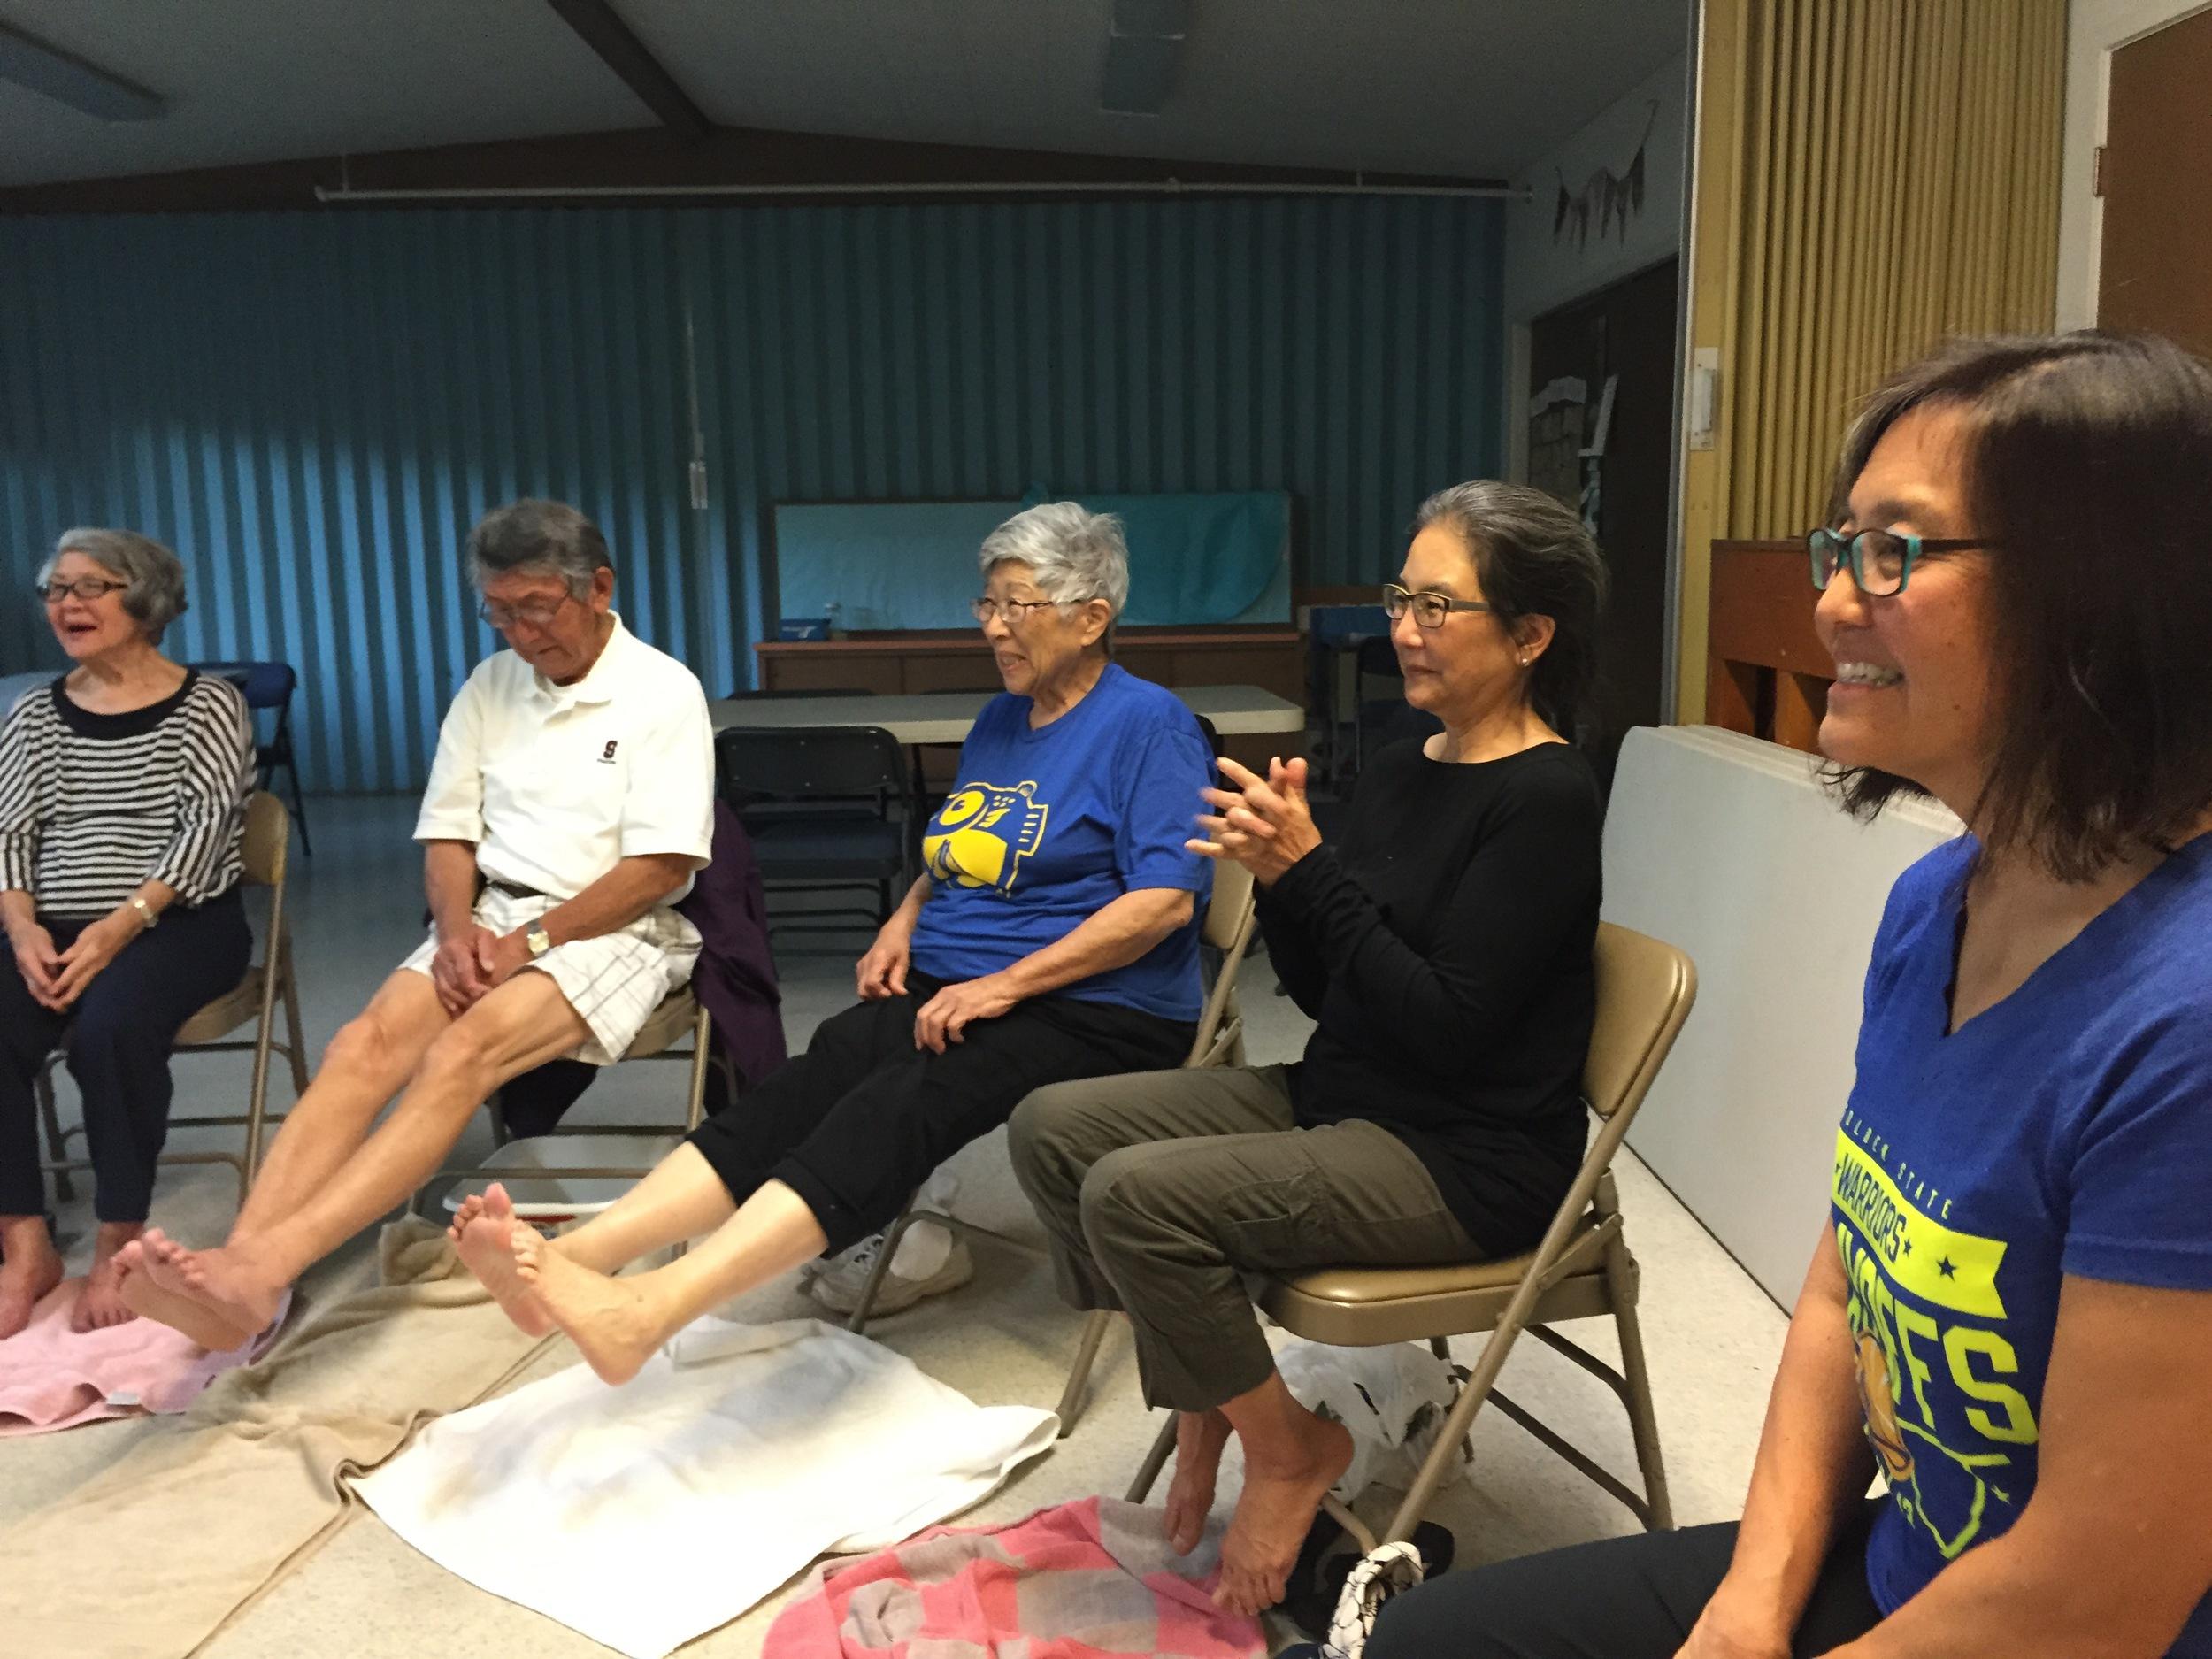 reiki and healing arts participants